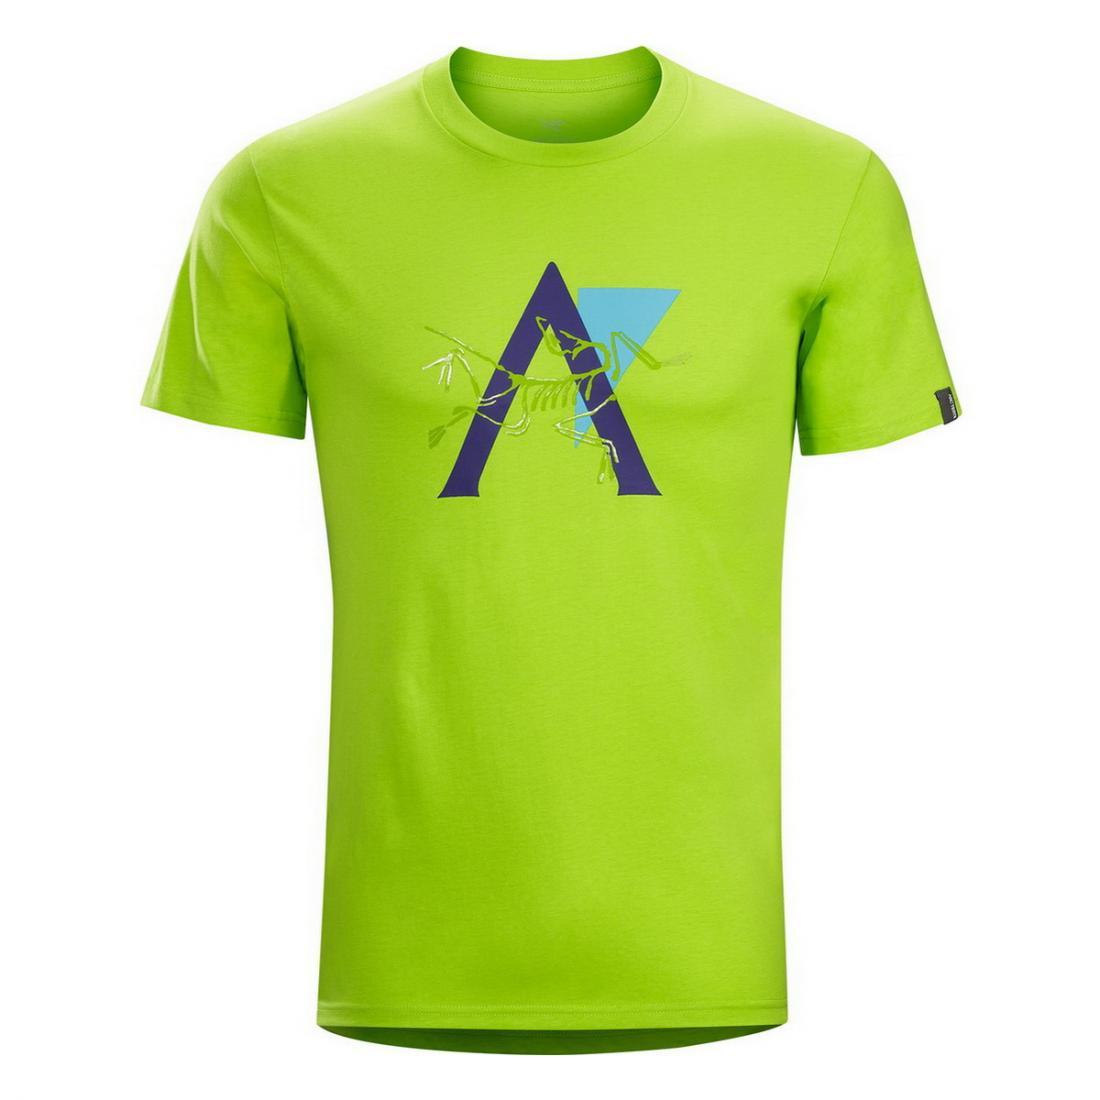 Футболка Stack SS T-Shirt муж.Футболки, поло<br><br><br>Цвет: Салатовый<br>Размер: XL